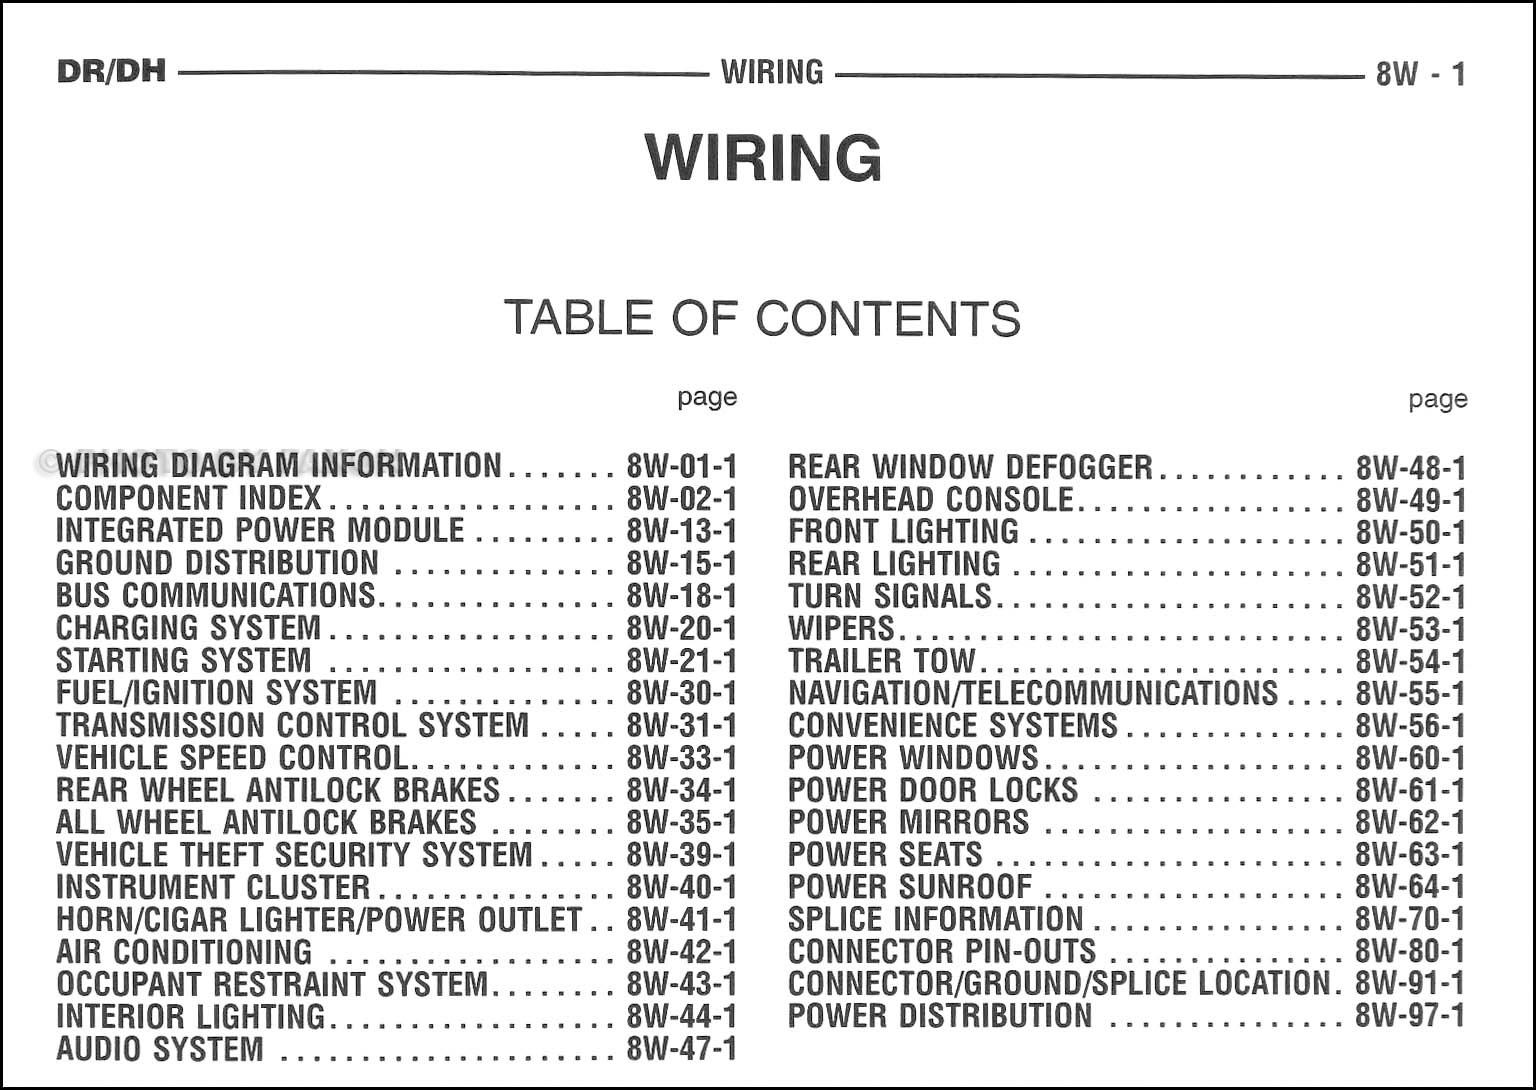 2006 Dodge Ram Wiring Schematic Wiring Diagram Report1 Report1 Maceratadoc It